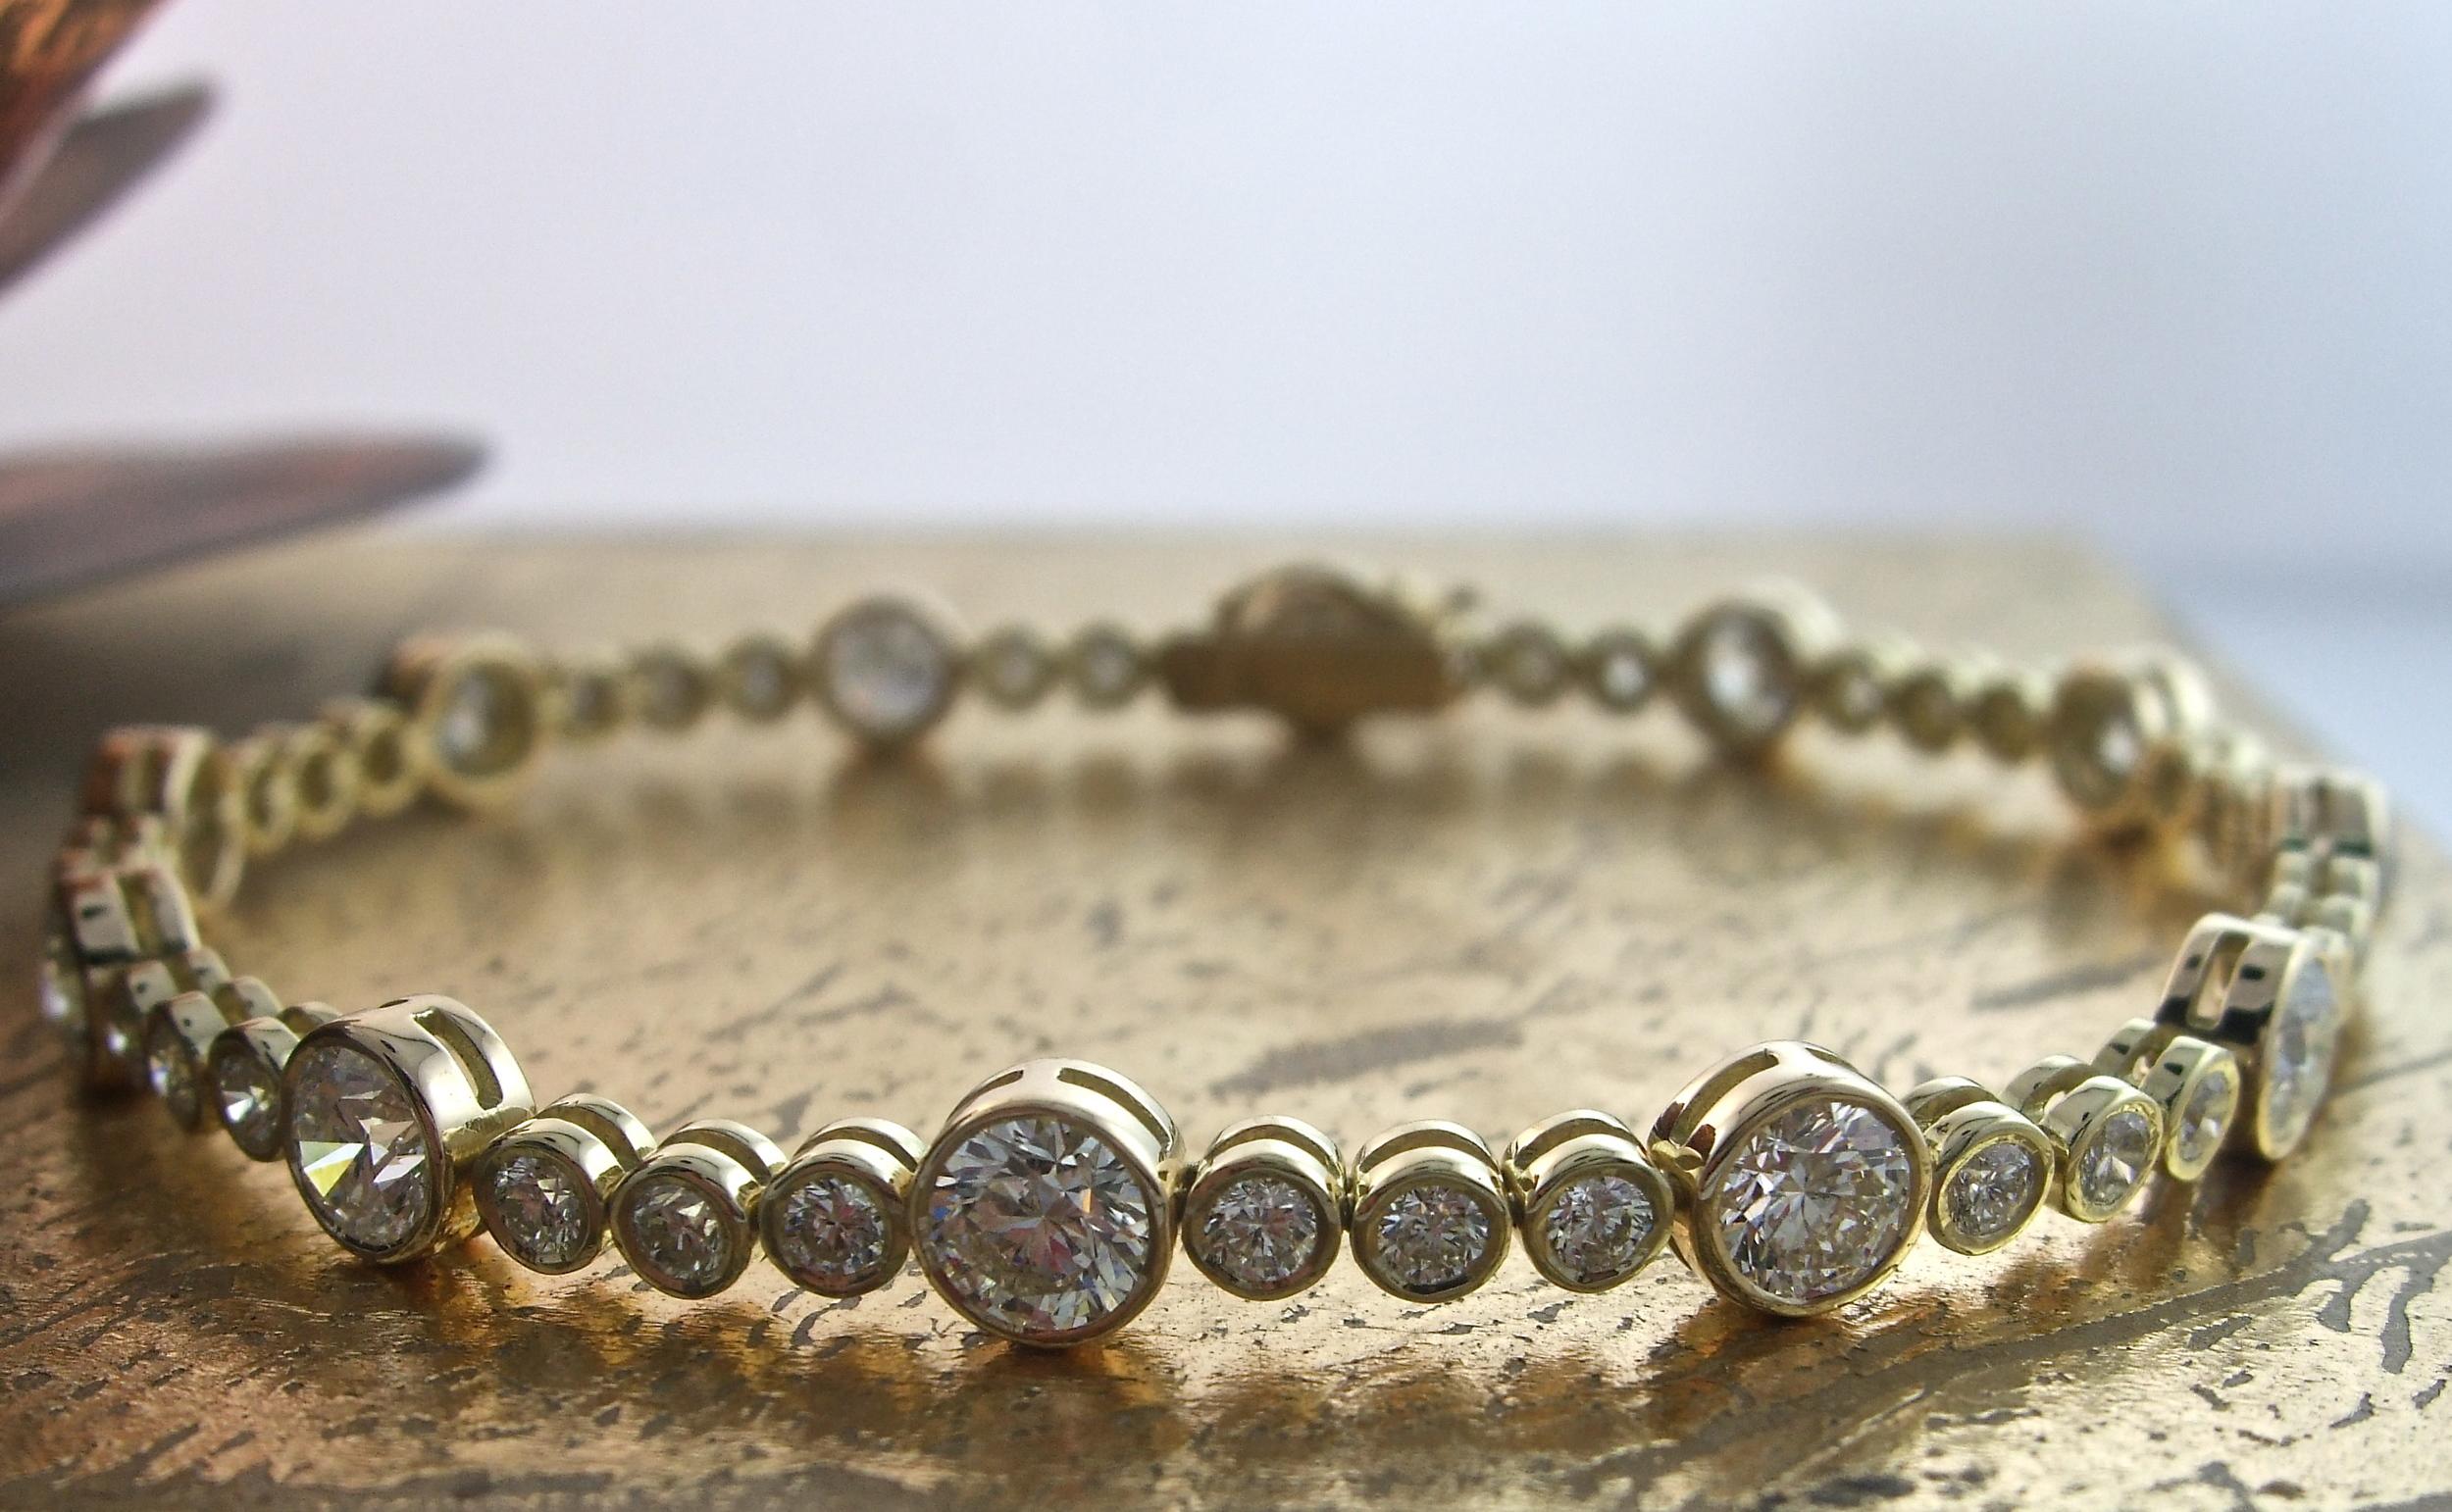 Tennis Bracelet in Bezel Setting - Item No: 0013528